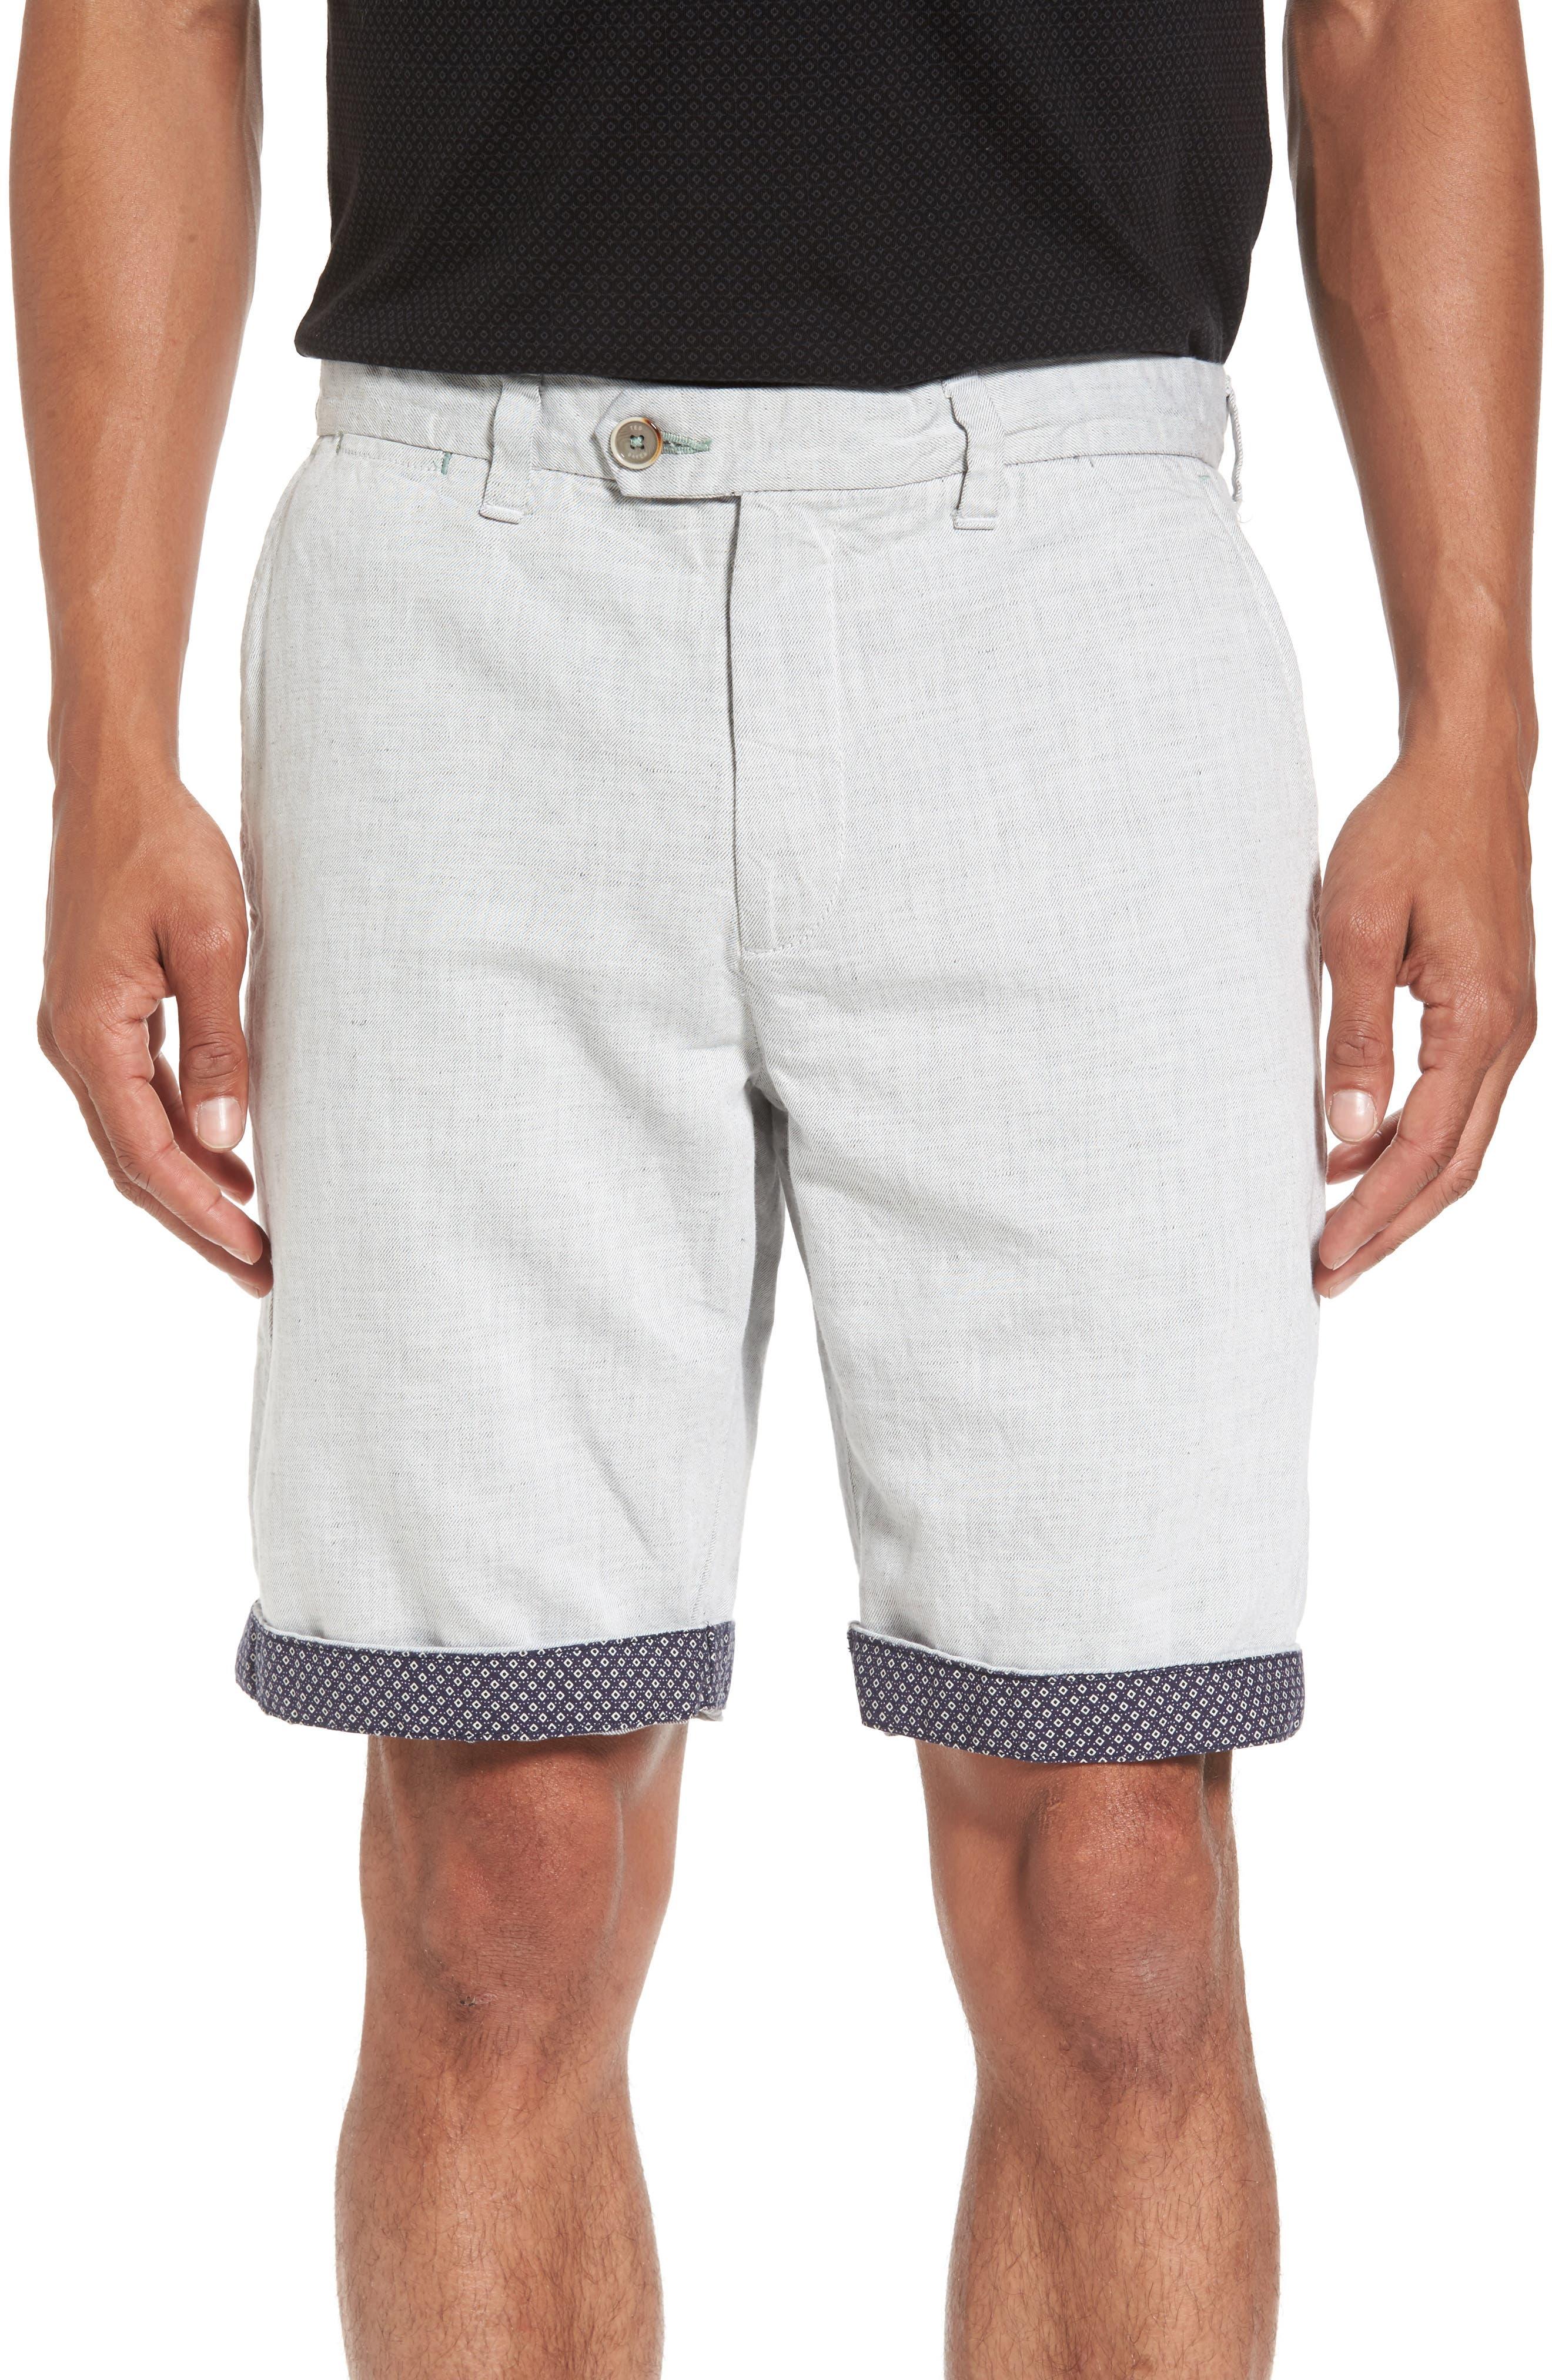 Frisho Cuff Denim Shorts,                             Alternate thumbnail 5, color,                             Light Grey